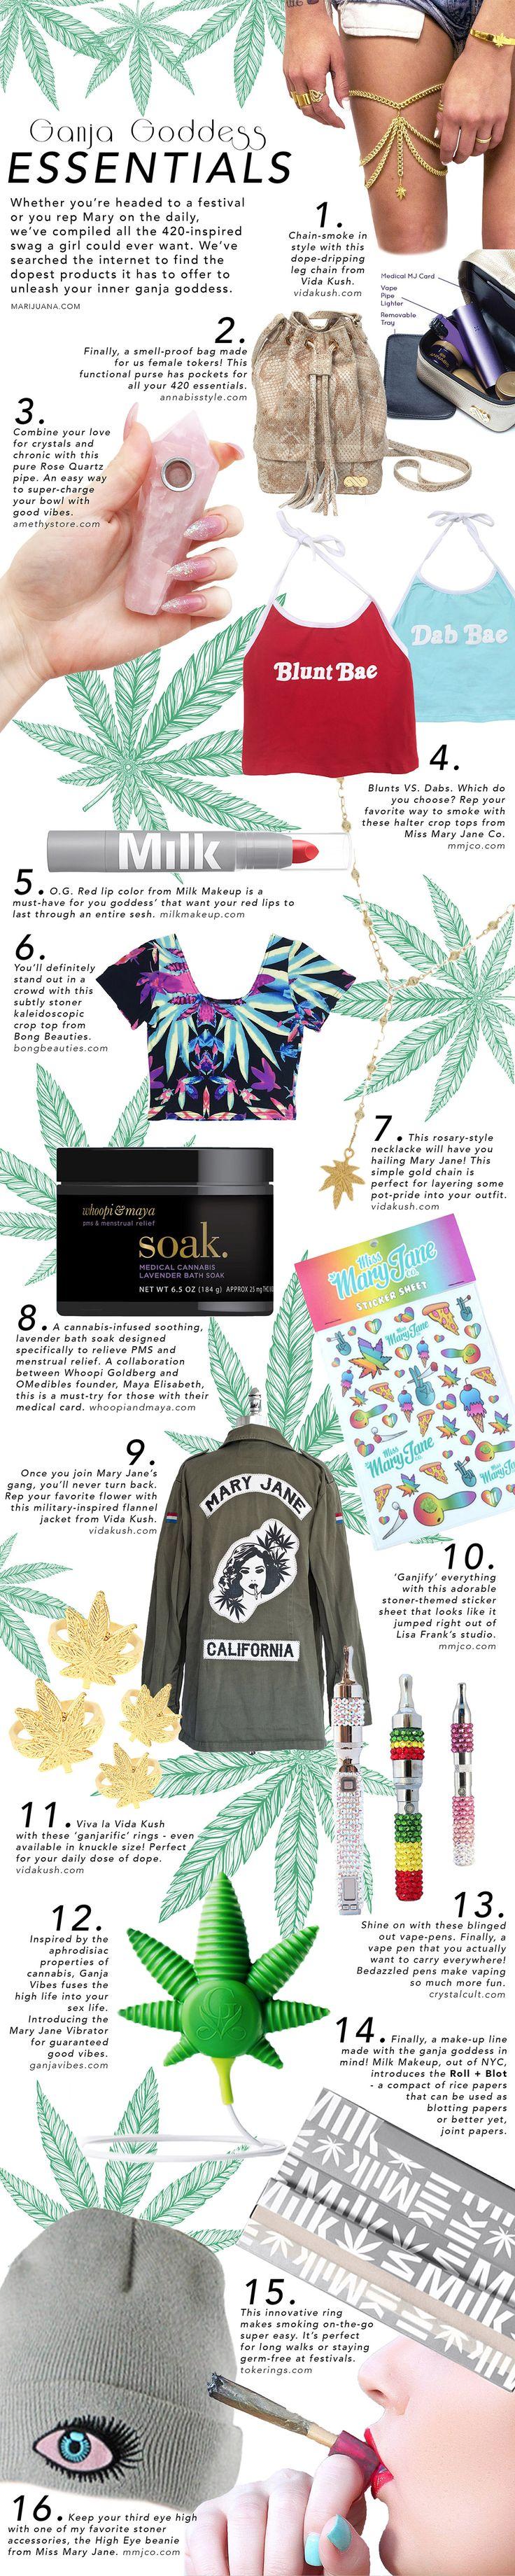 Best 25 Cannabis ideas on Pinterest